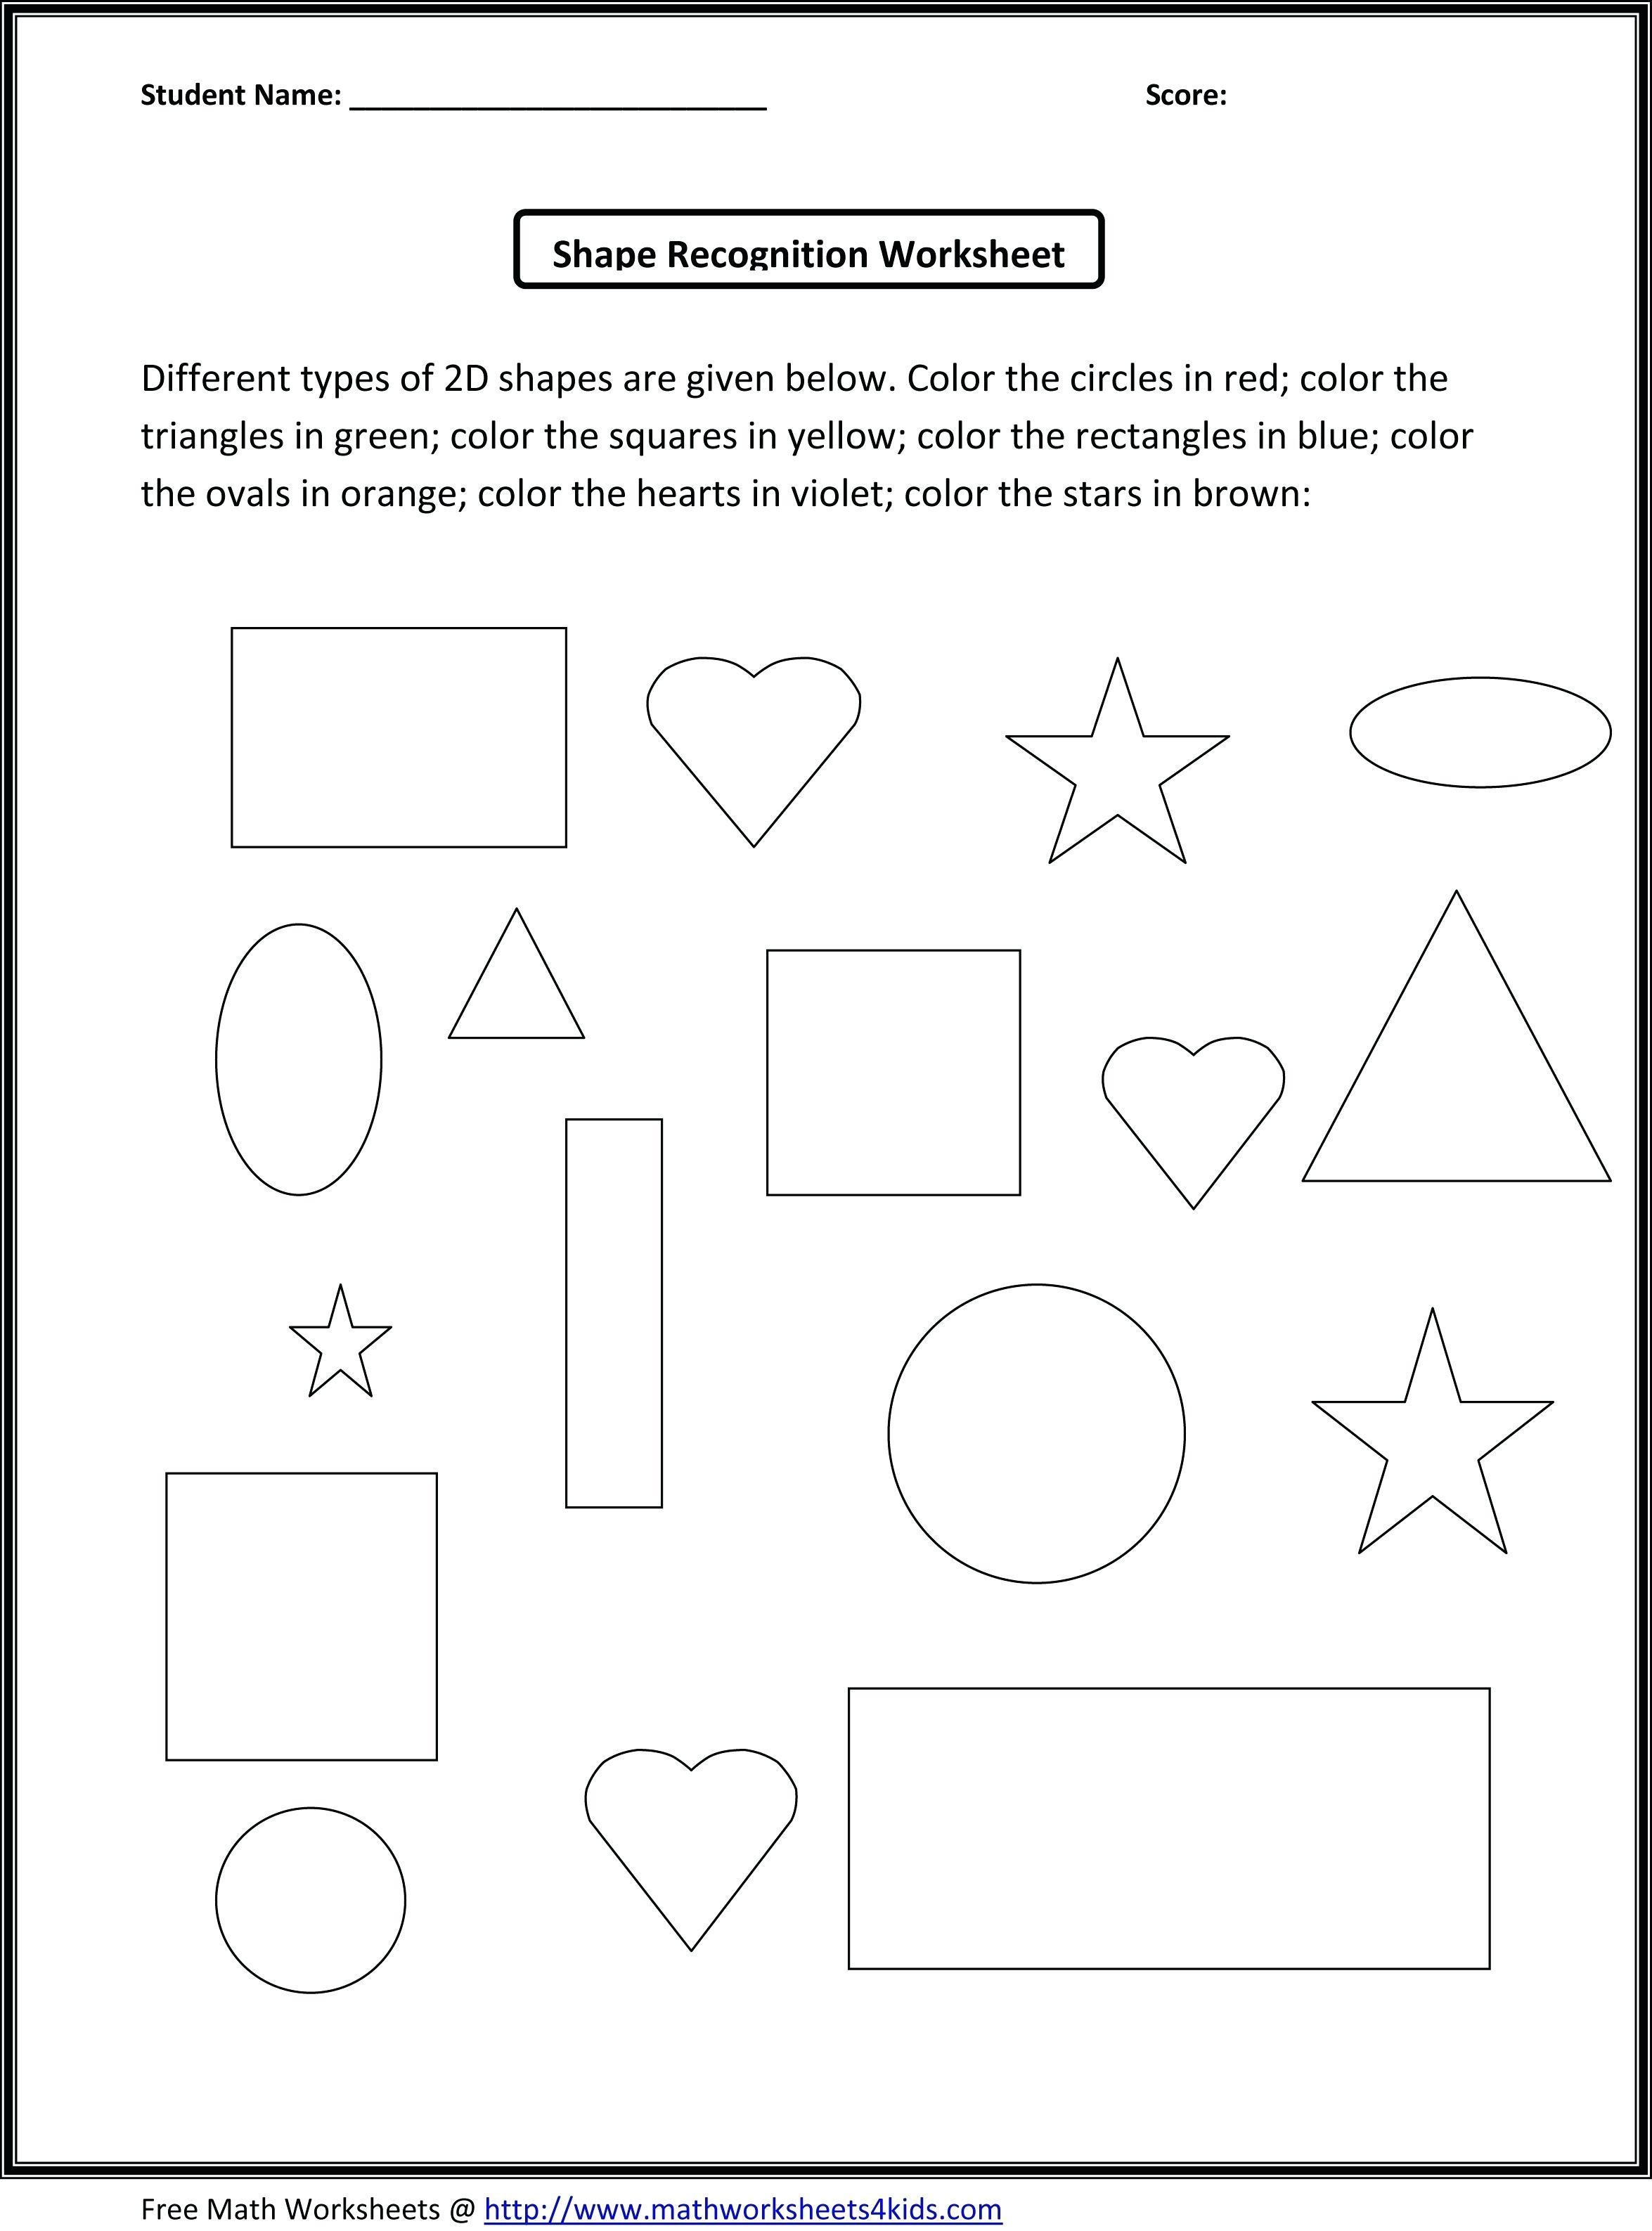 Printable Keyboarding Worksheets Star Craft Preschool Printable Activities Clover Hatunisi